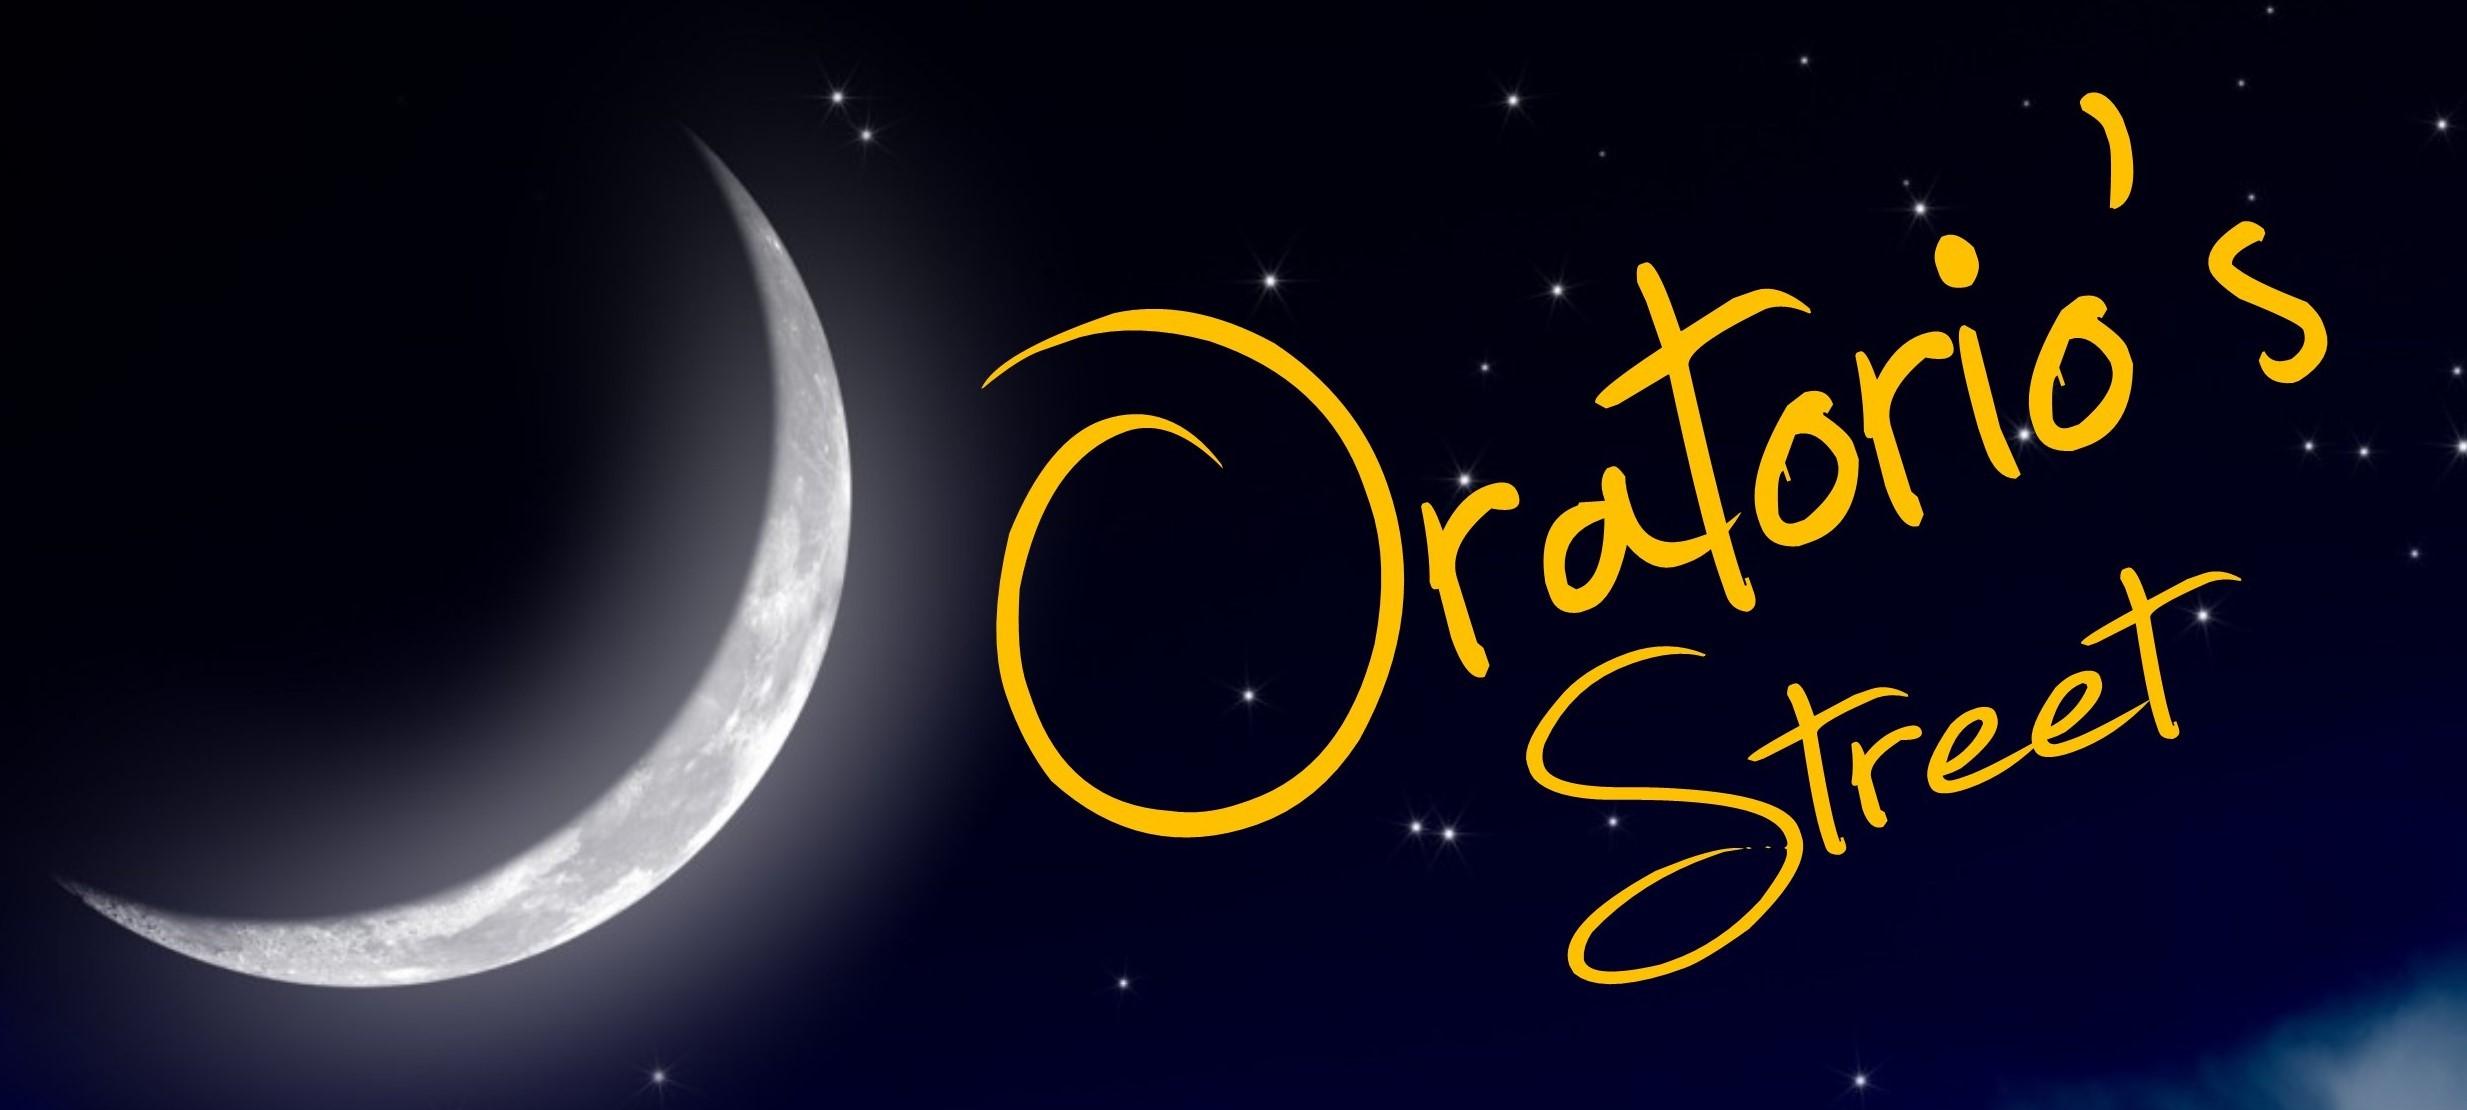 Oratorio's_street - quadrato